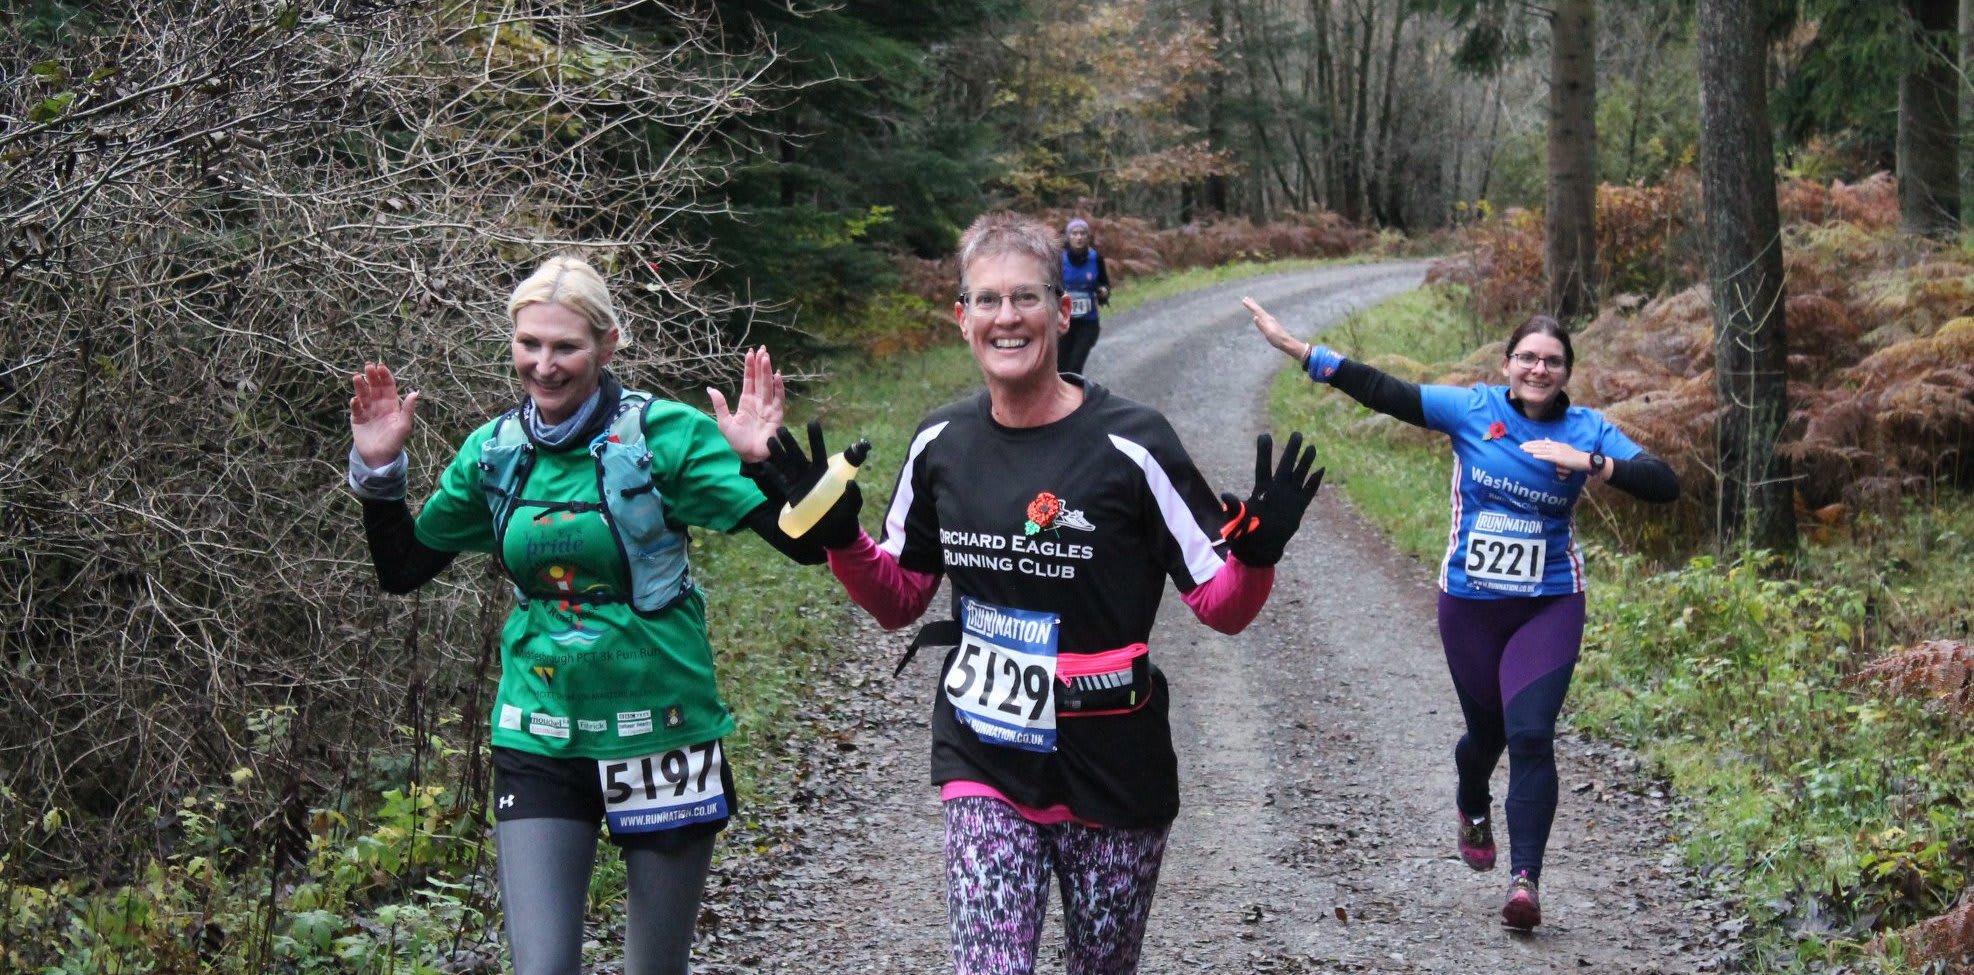 Run Durham Hamsterley - Remembrance 10 Miler & 5 Miler